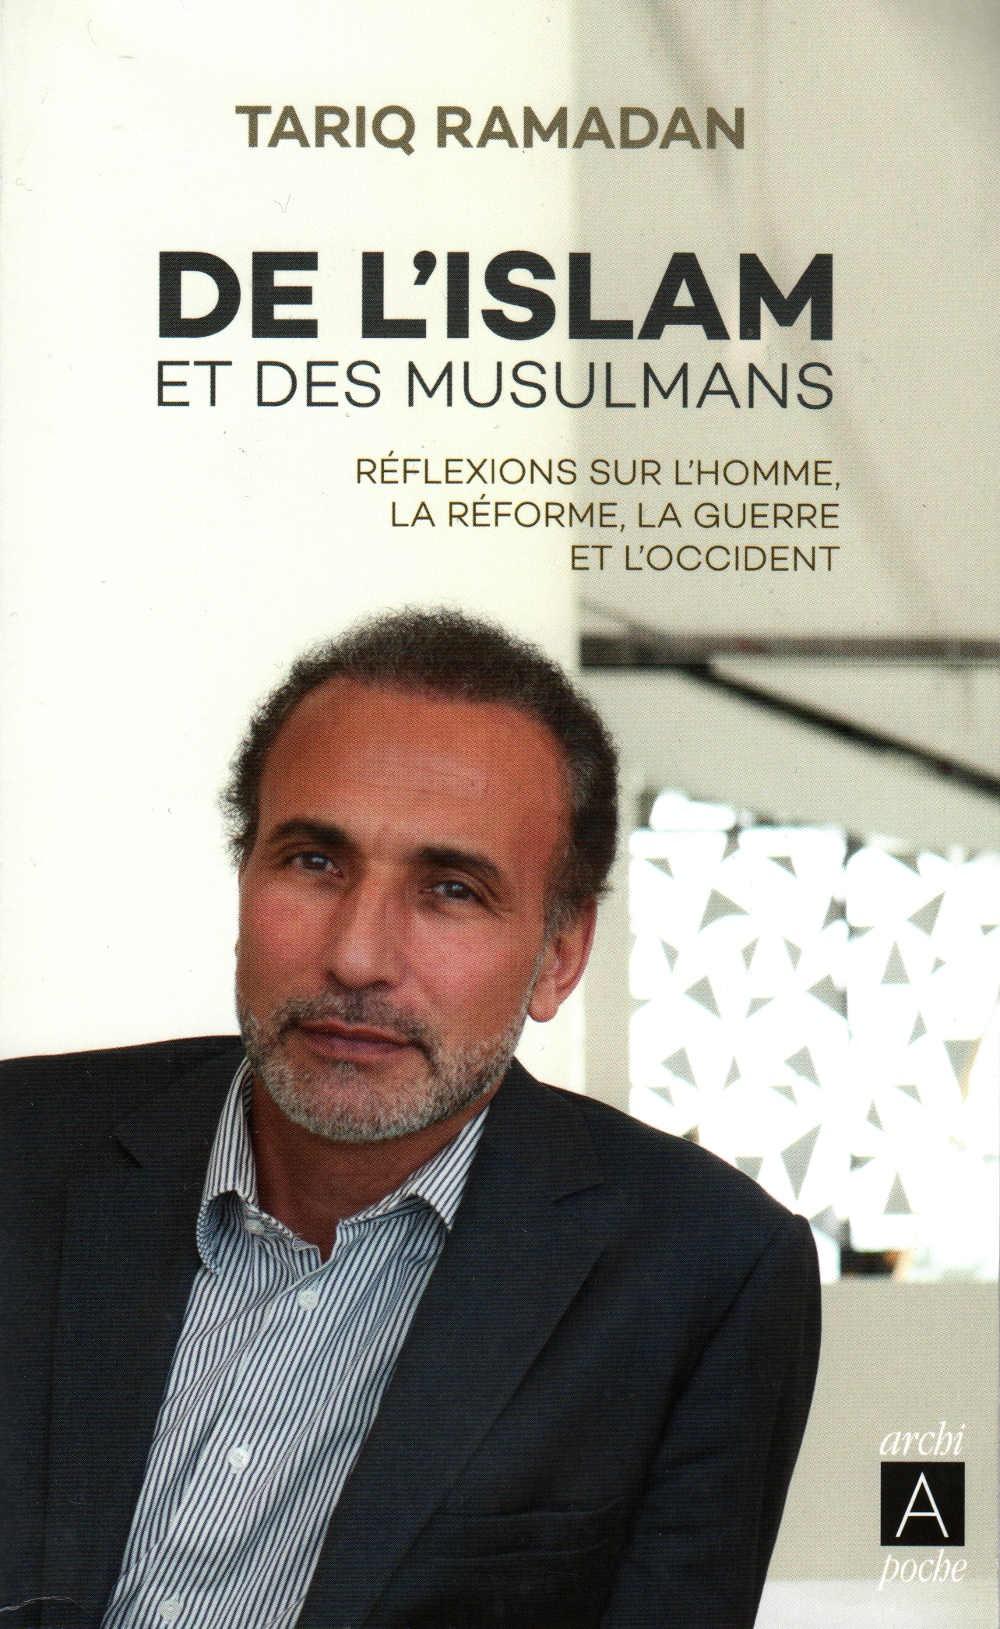 de lislam et des musulmans de tariq ramadan - Mariage Mixte Islam Tariq Ramadan